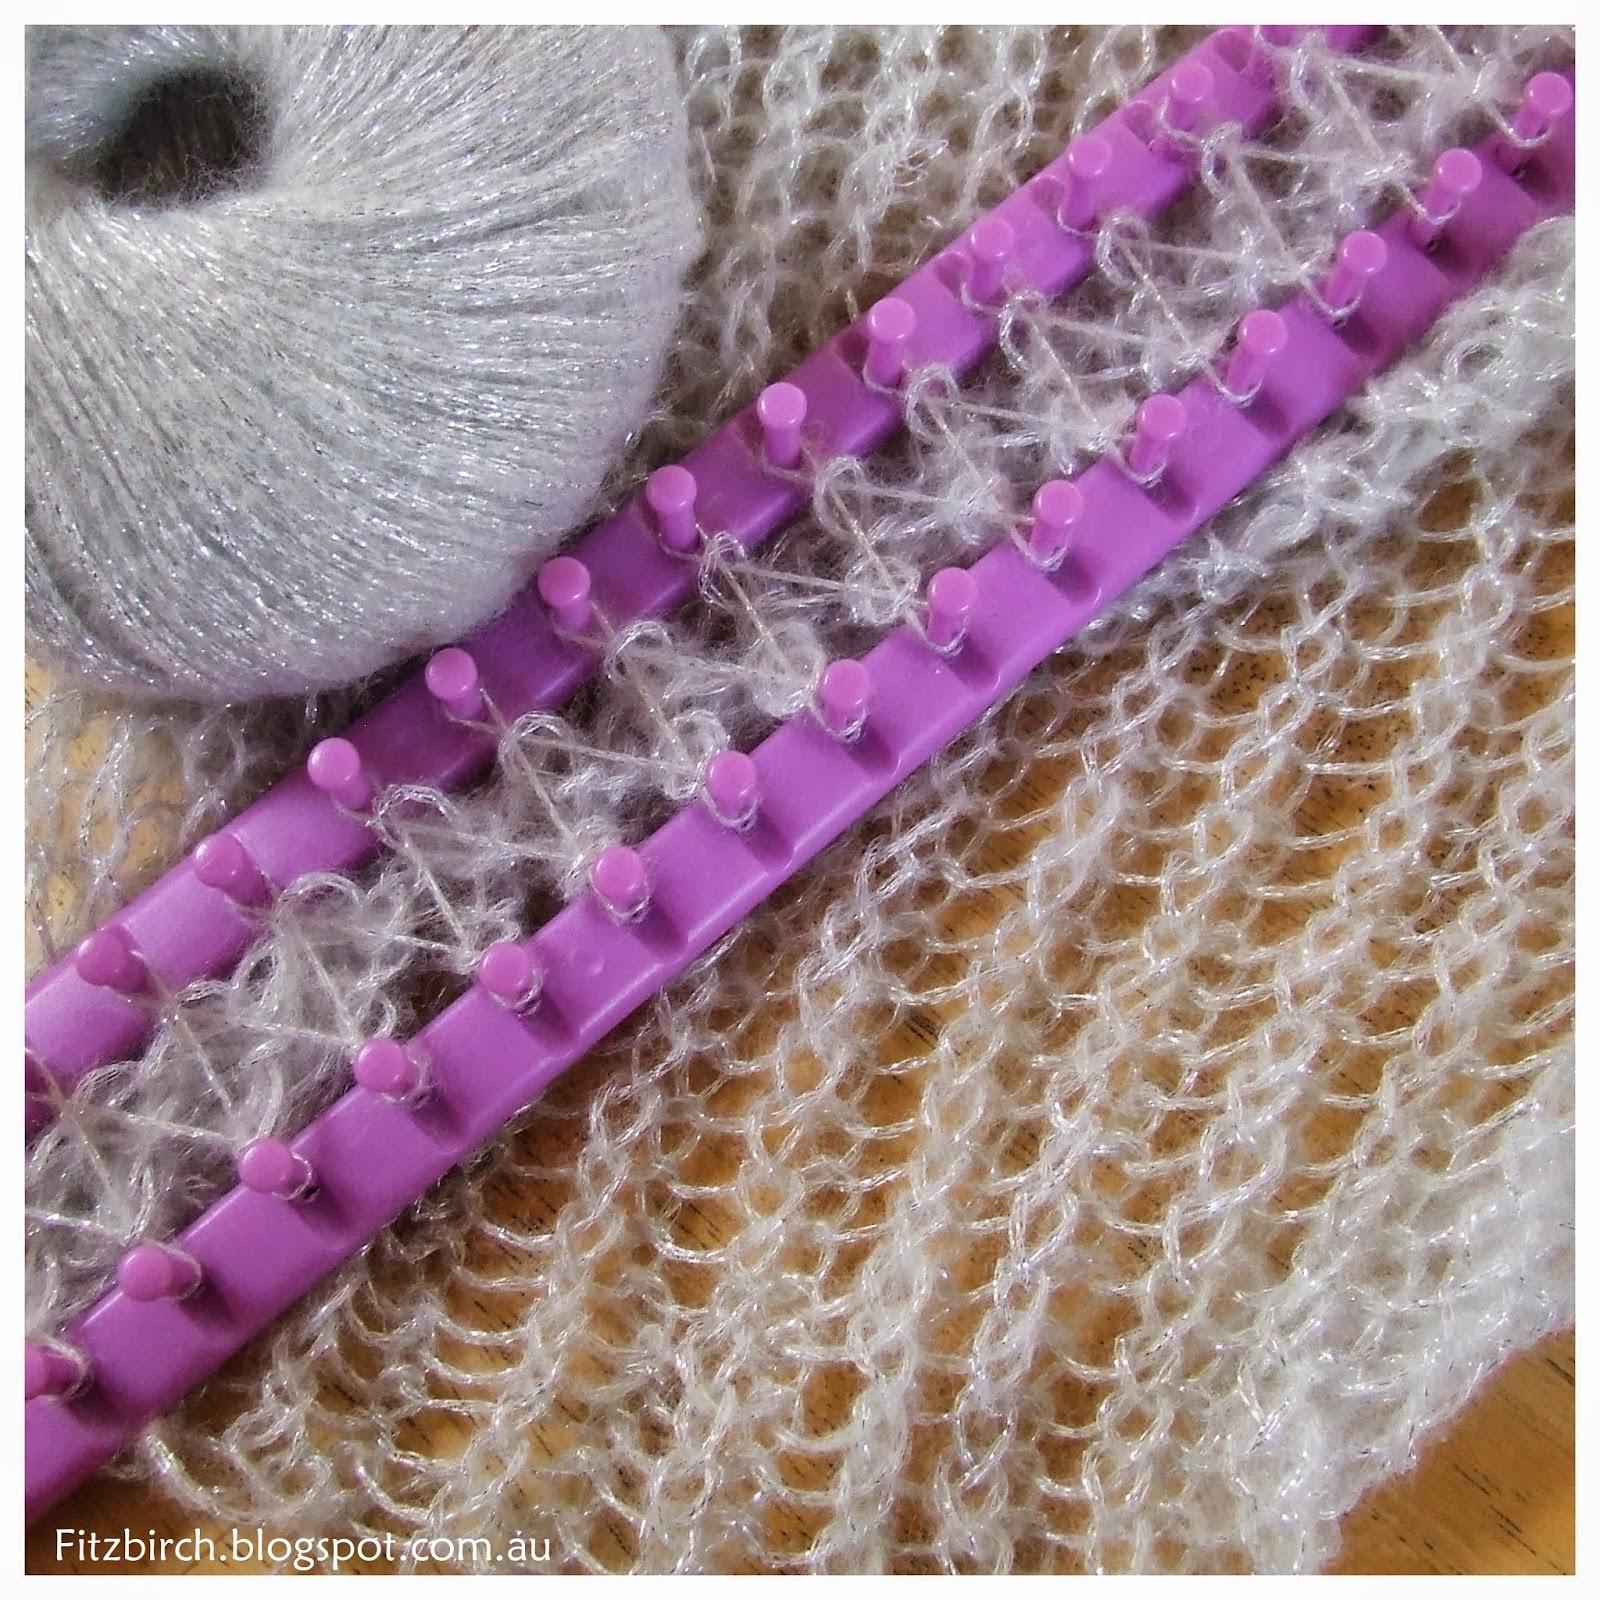 Knitting Wallpaper Uk : Fitzbirch crafts quick loom knit scarf auto design tech